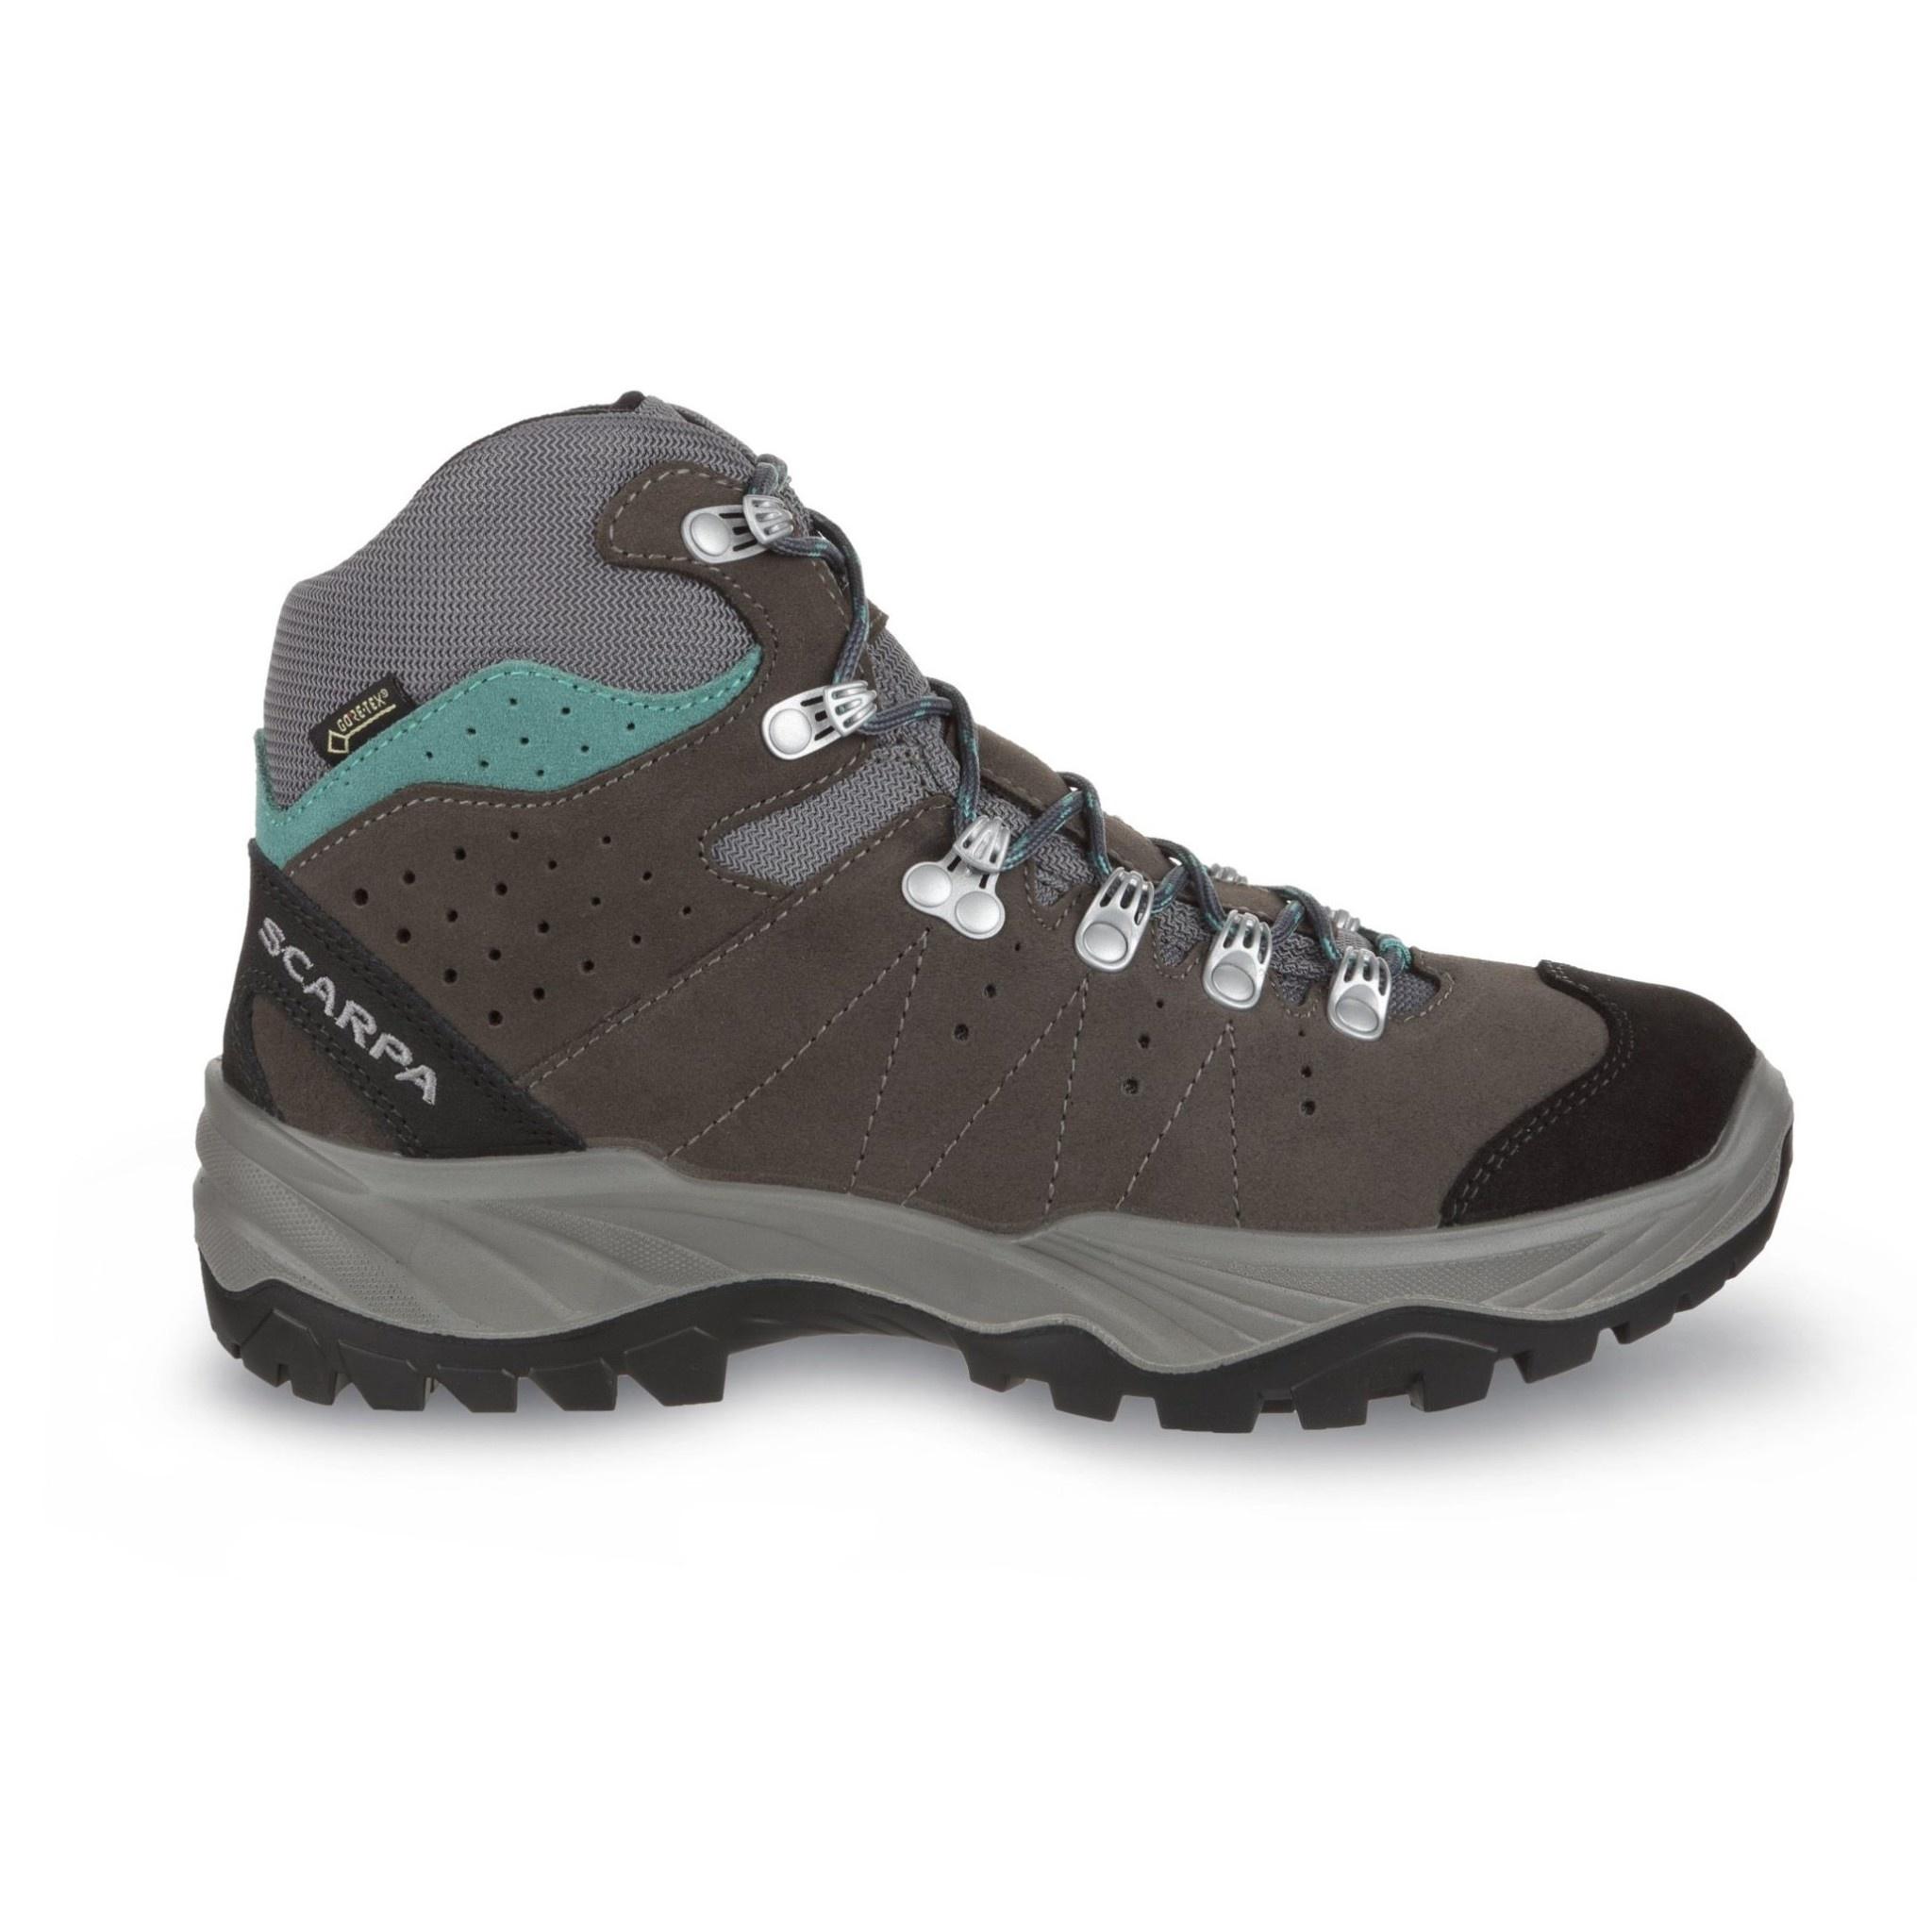 58692d203c8 Scarpa Mistral GTX Hiking Boots - Women | Vertical Addiction